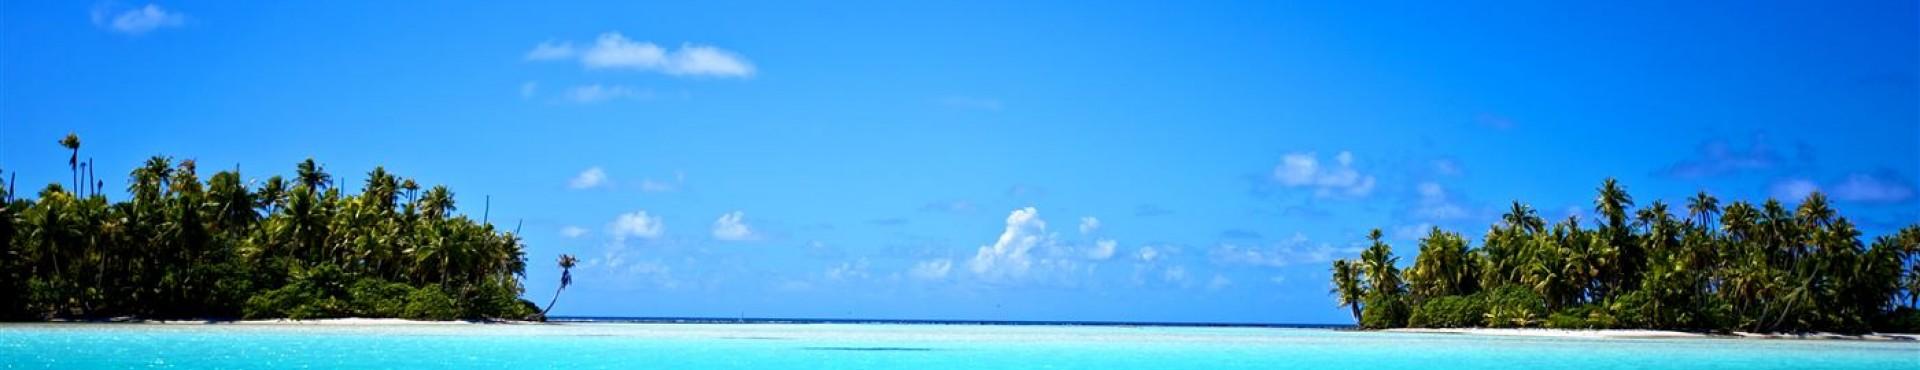 Polynesien urlaub buchen beim spezialisten polynesia select for Rangiroa urlaub